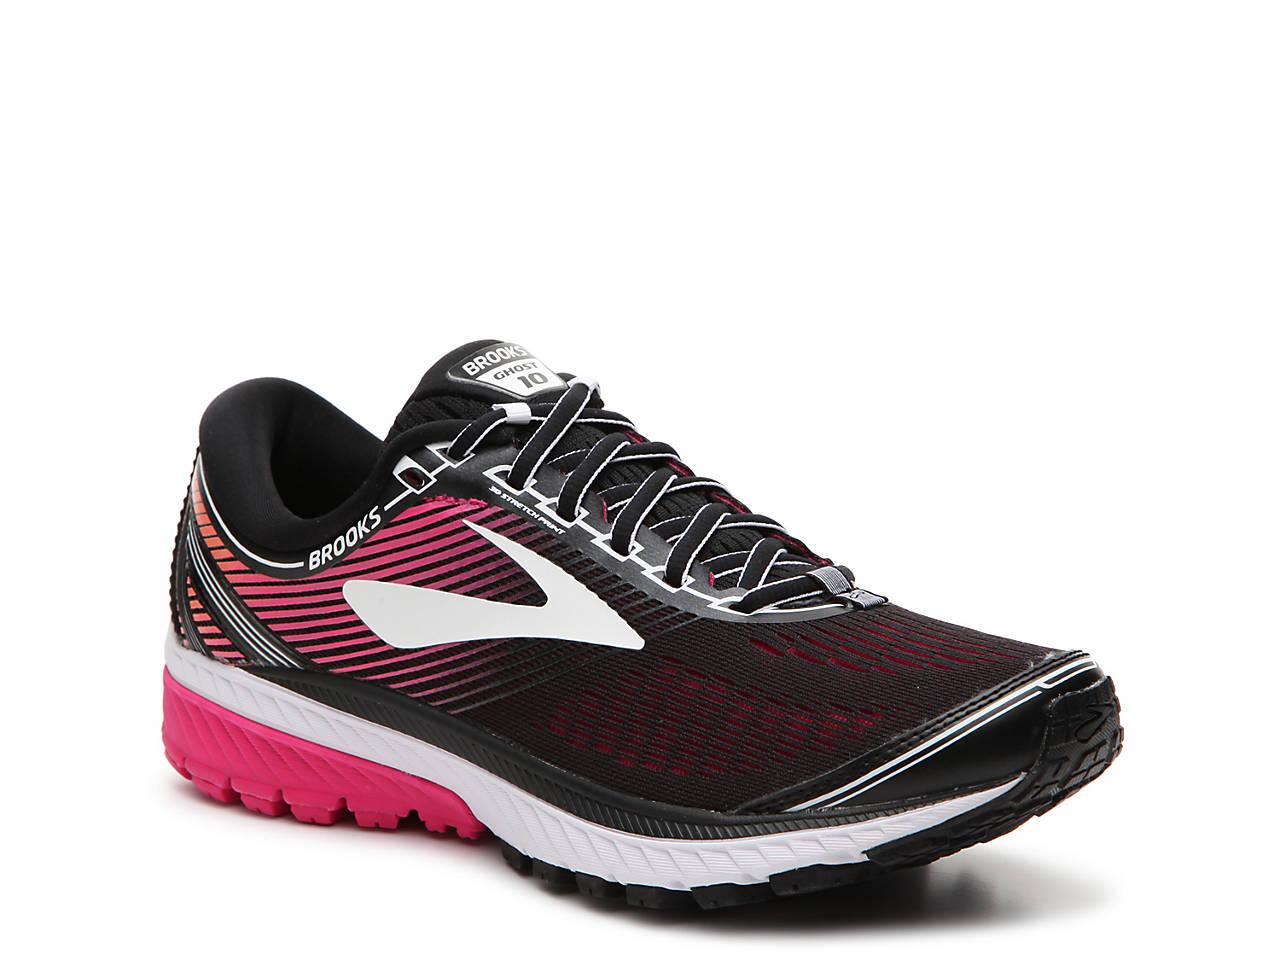 d8c447120cb Brooks Ghost 10 Running Shoe - Women s Women s Shoes